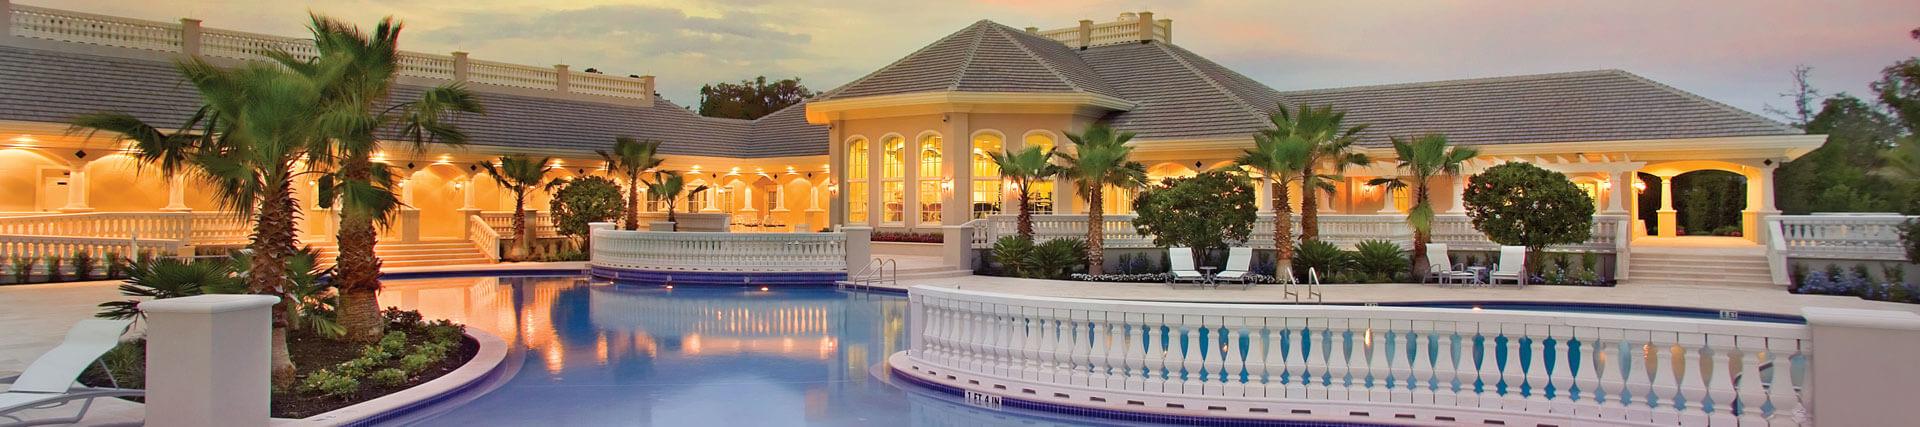 golf community swimming pool